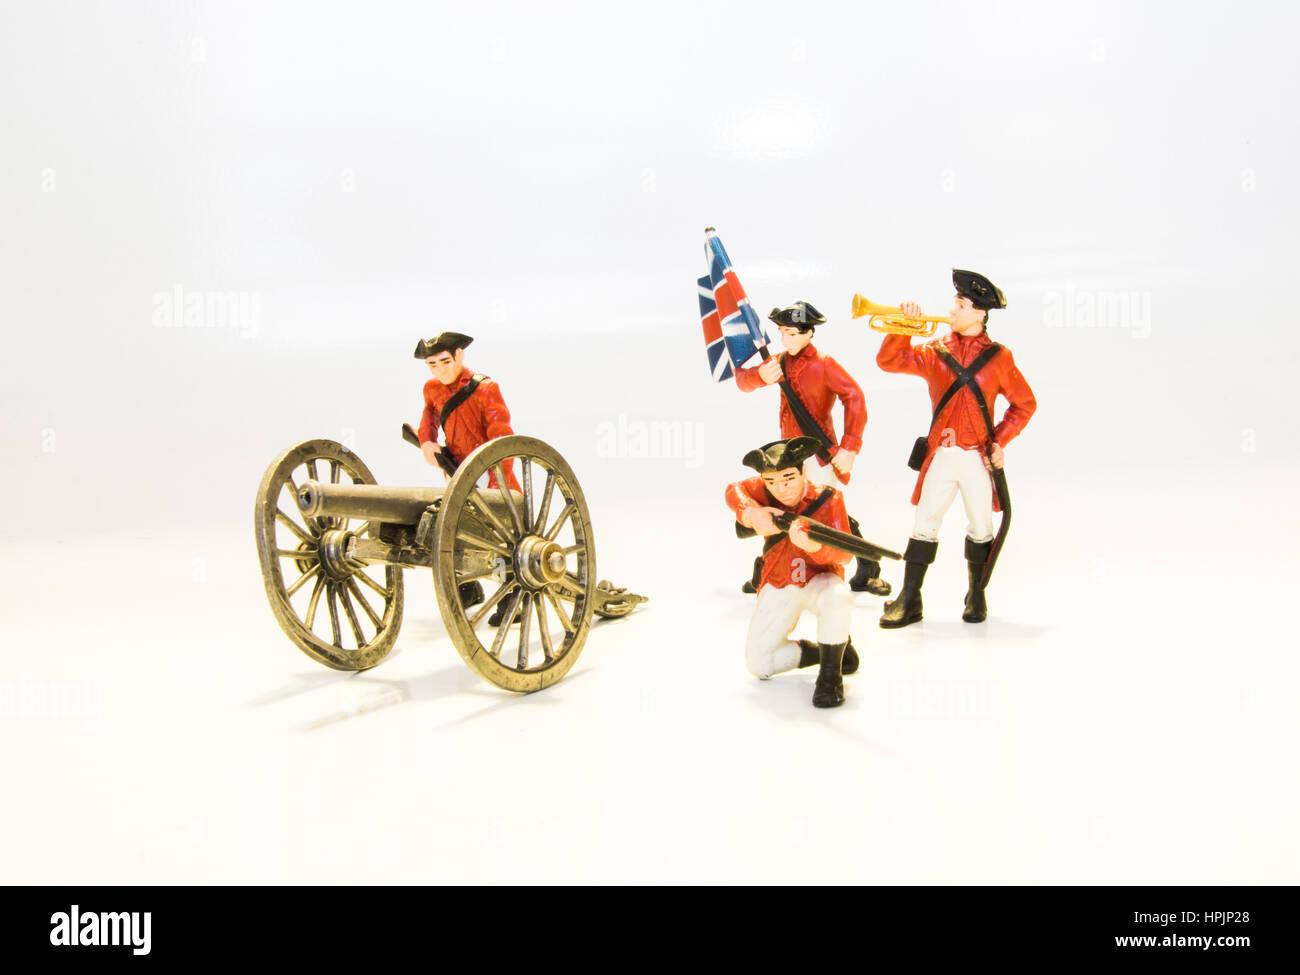 British army toys - Stock Image